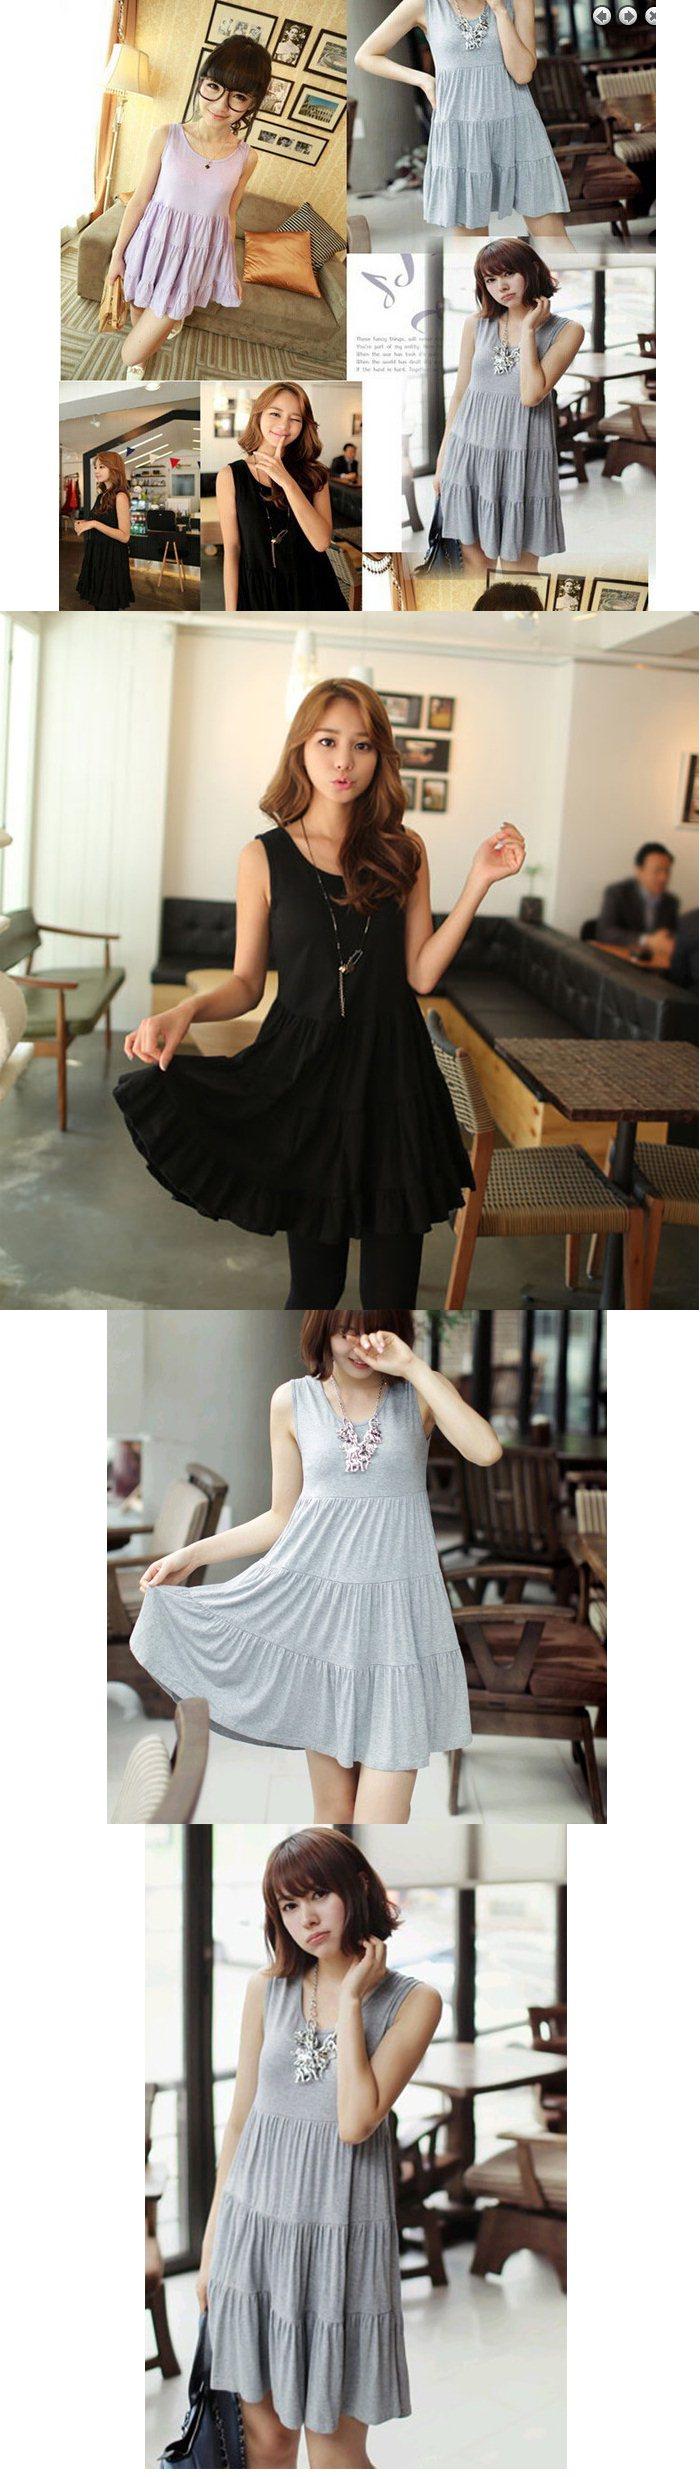 Black dress qoo10 - Black Dress Qoo10 7